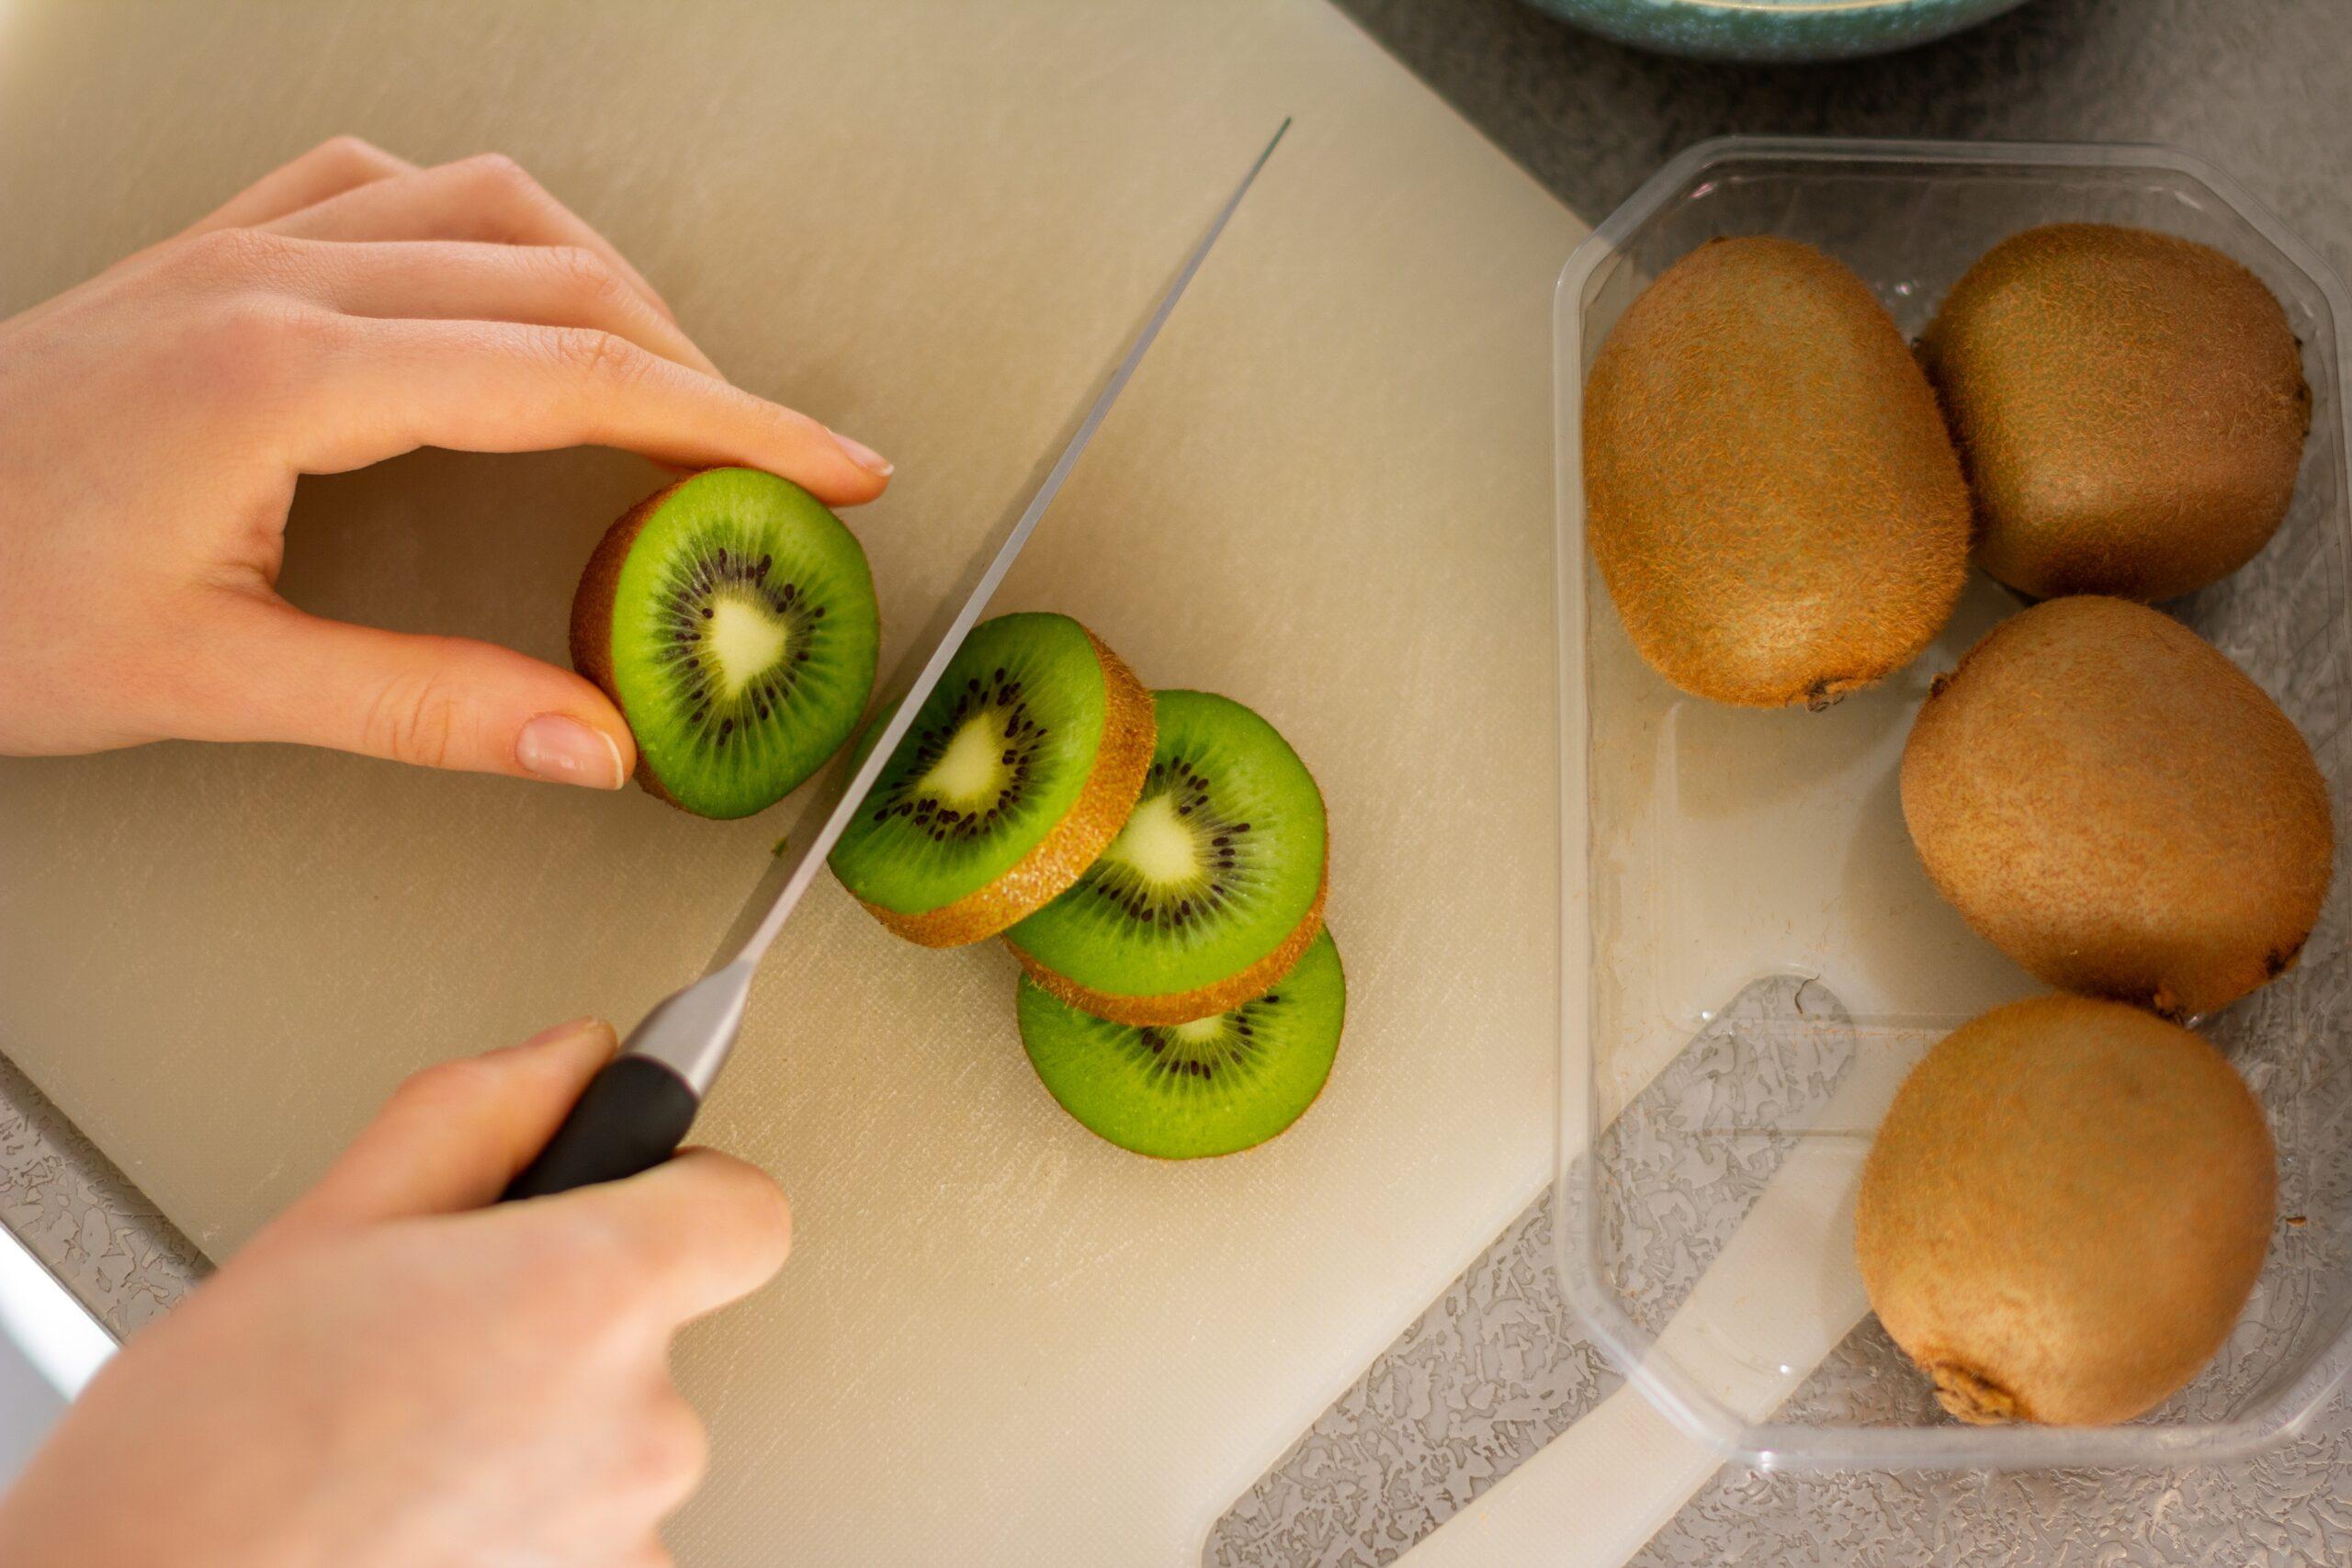 mmunity-boosting foods, how to boost your immunity, how to improve your immunity, flu, cold, cough, fever, covid-19, coronavirus, disease in monsoon, health shots